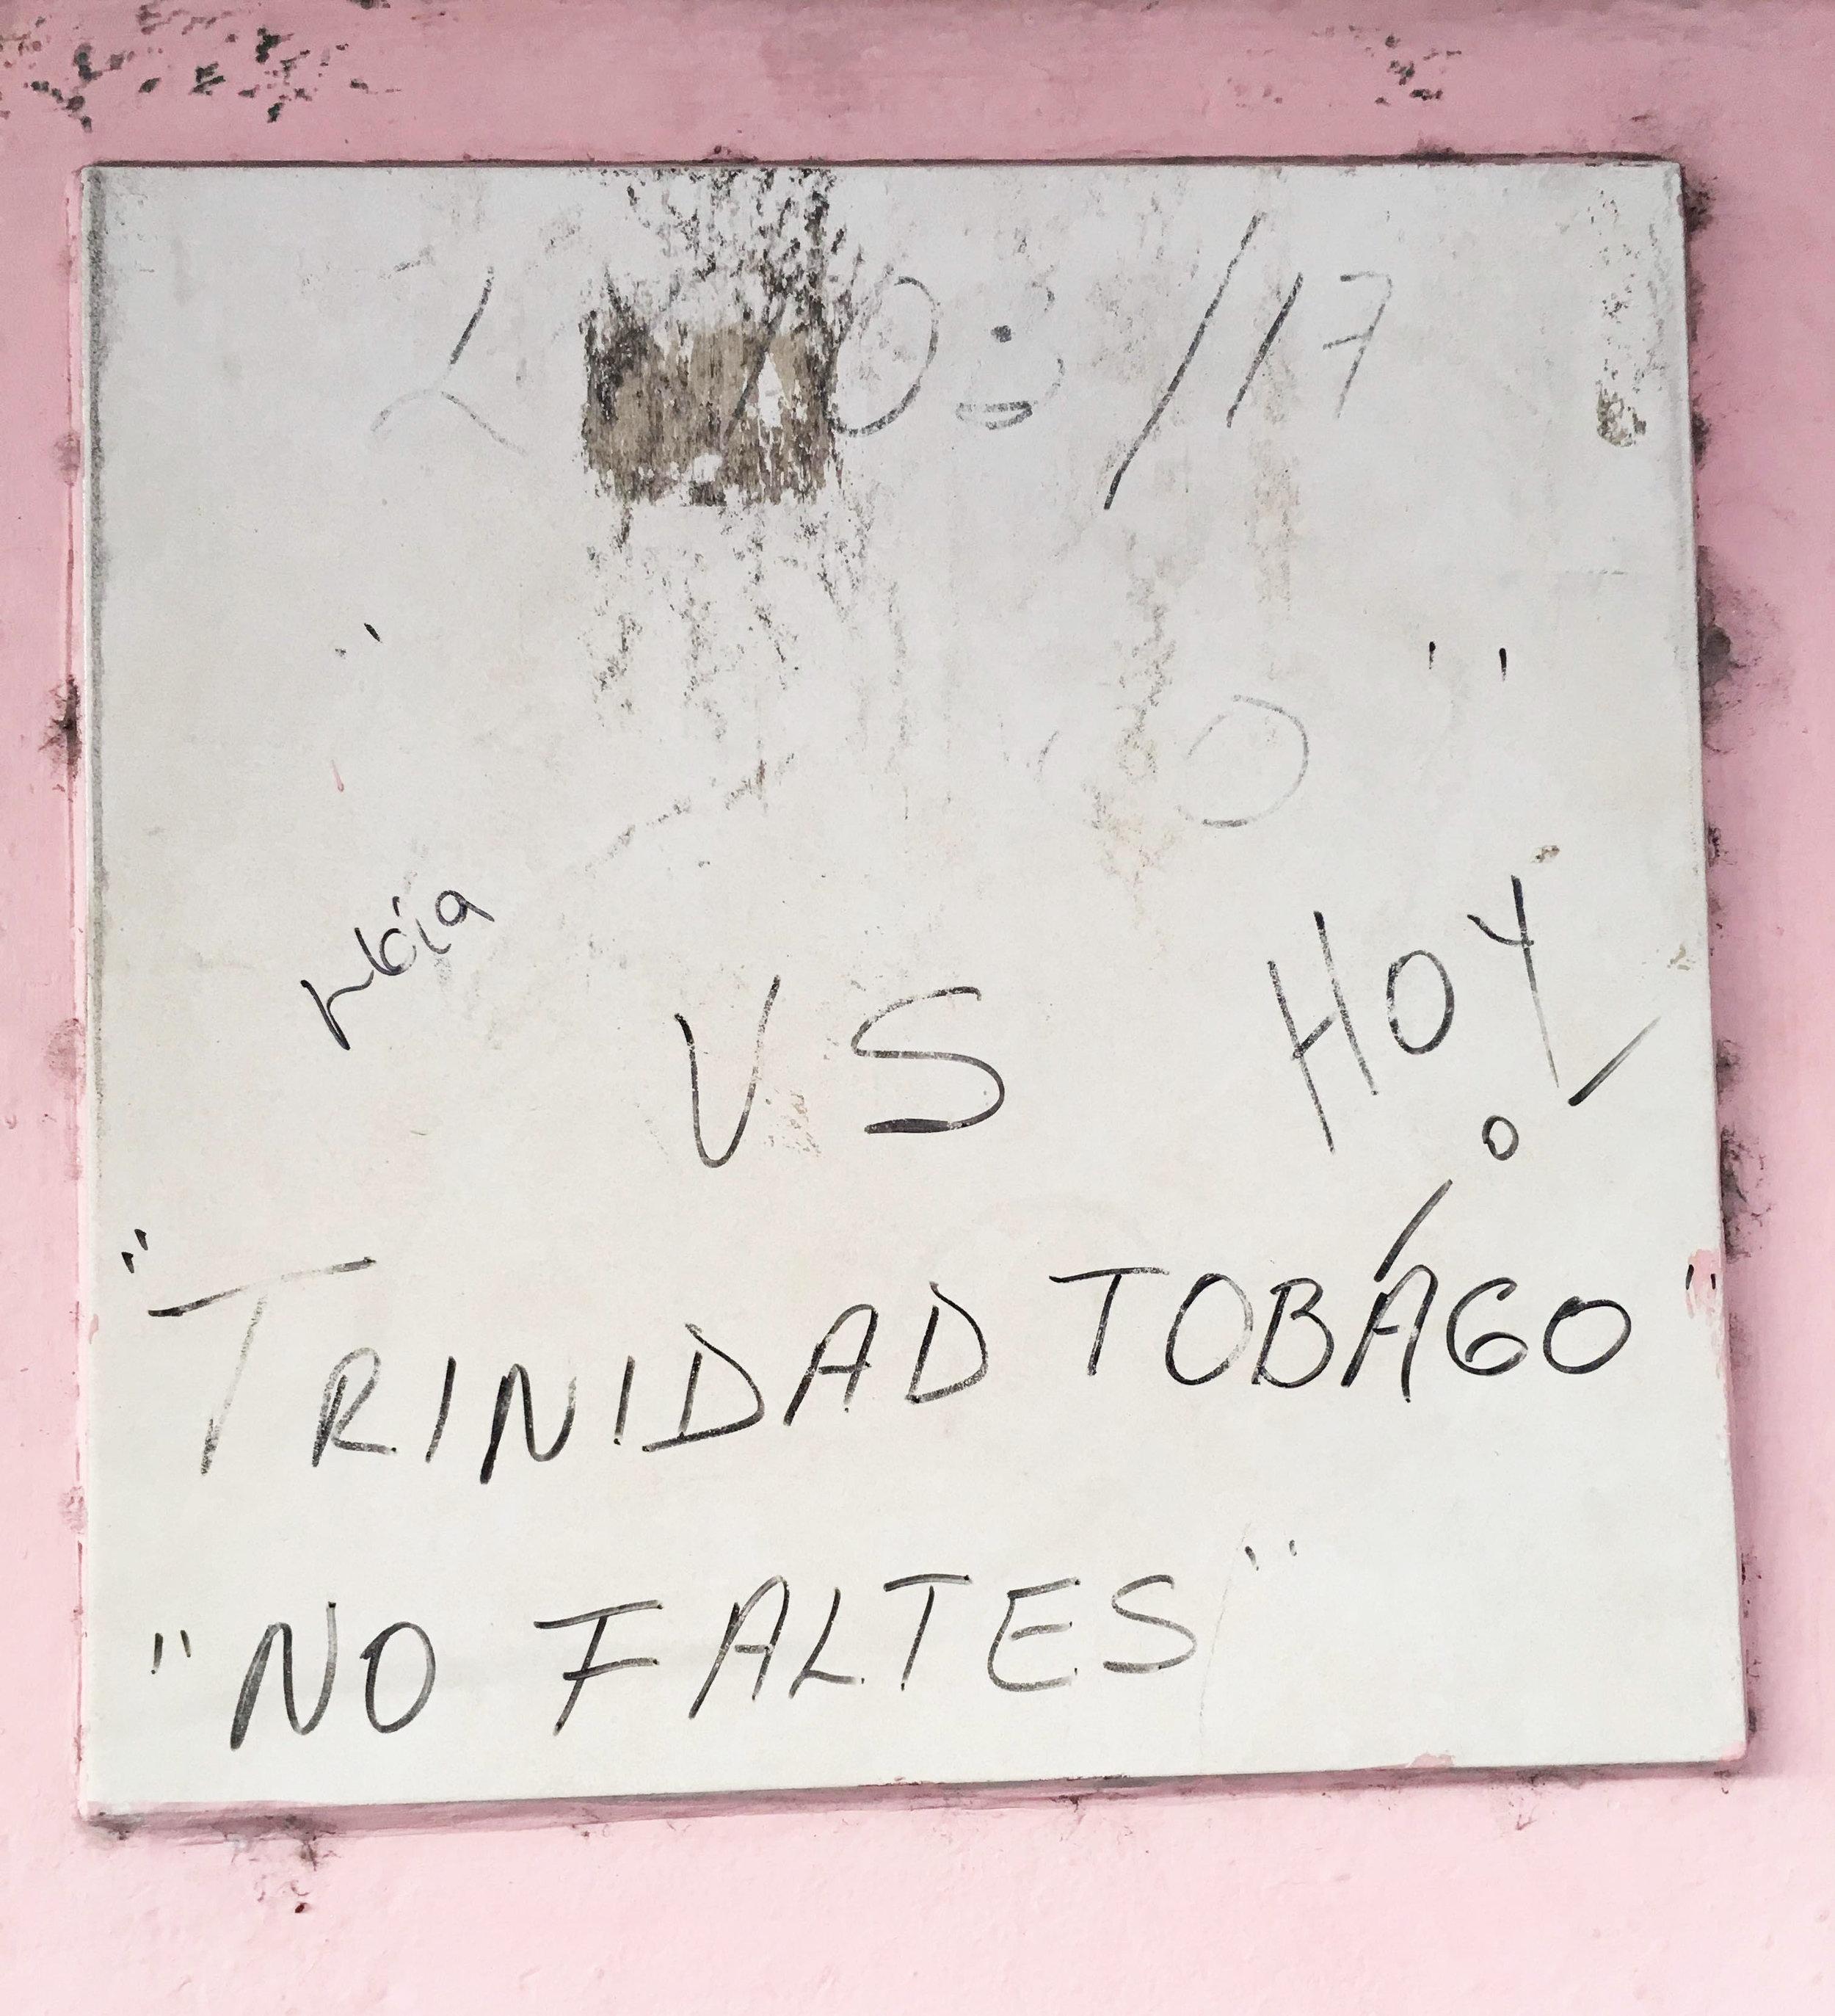 Spotted in Veracruz, Mexico